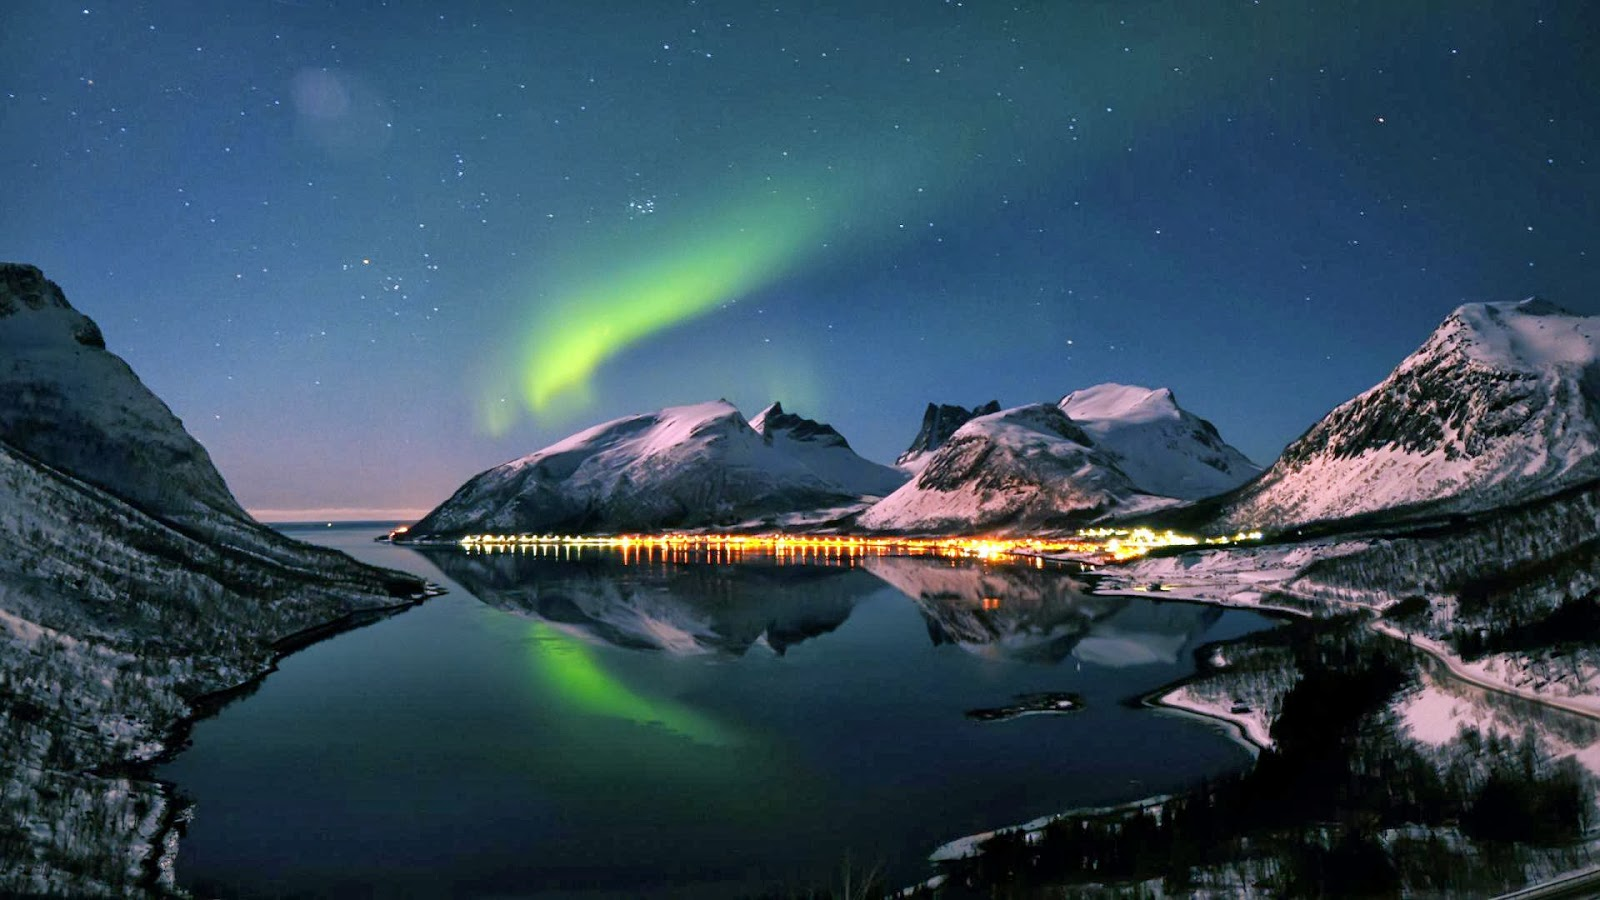 Fondo Escritorio Picos Montañas Nevadas: Fondo De Pantalla Paisaje Montañas Nevadas Con La Aurora